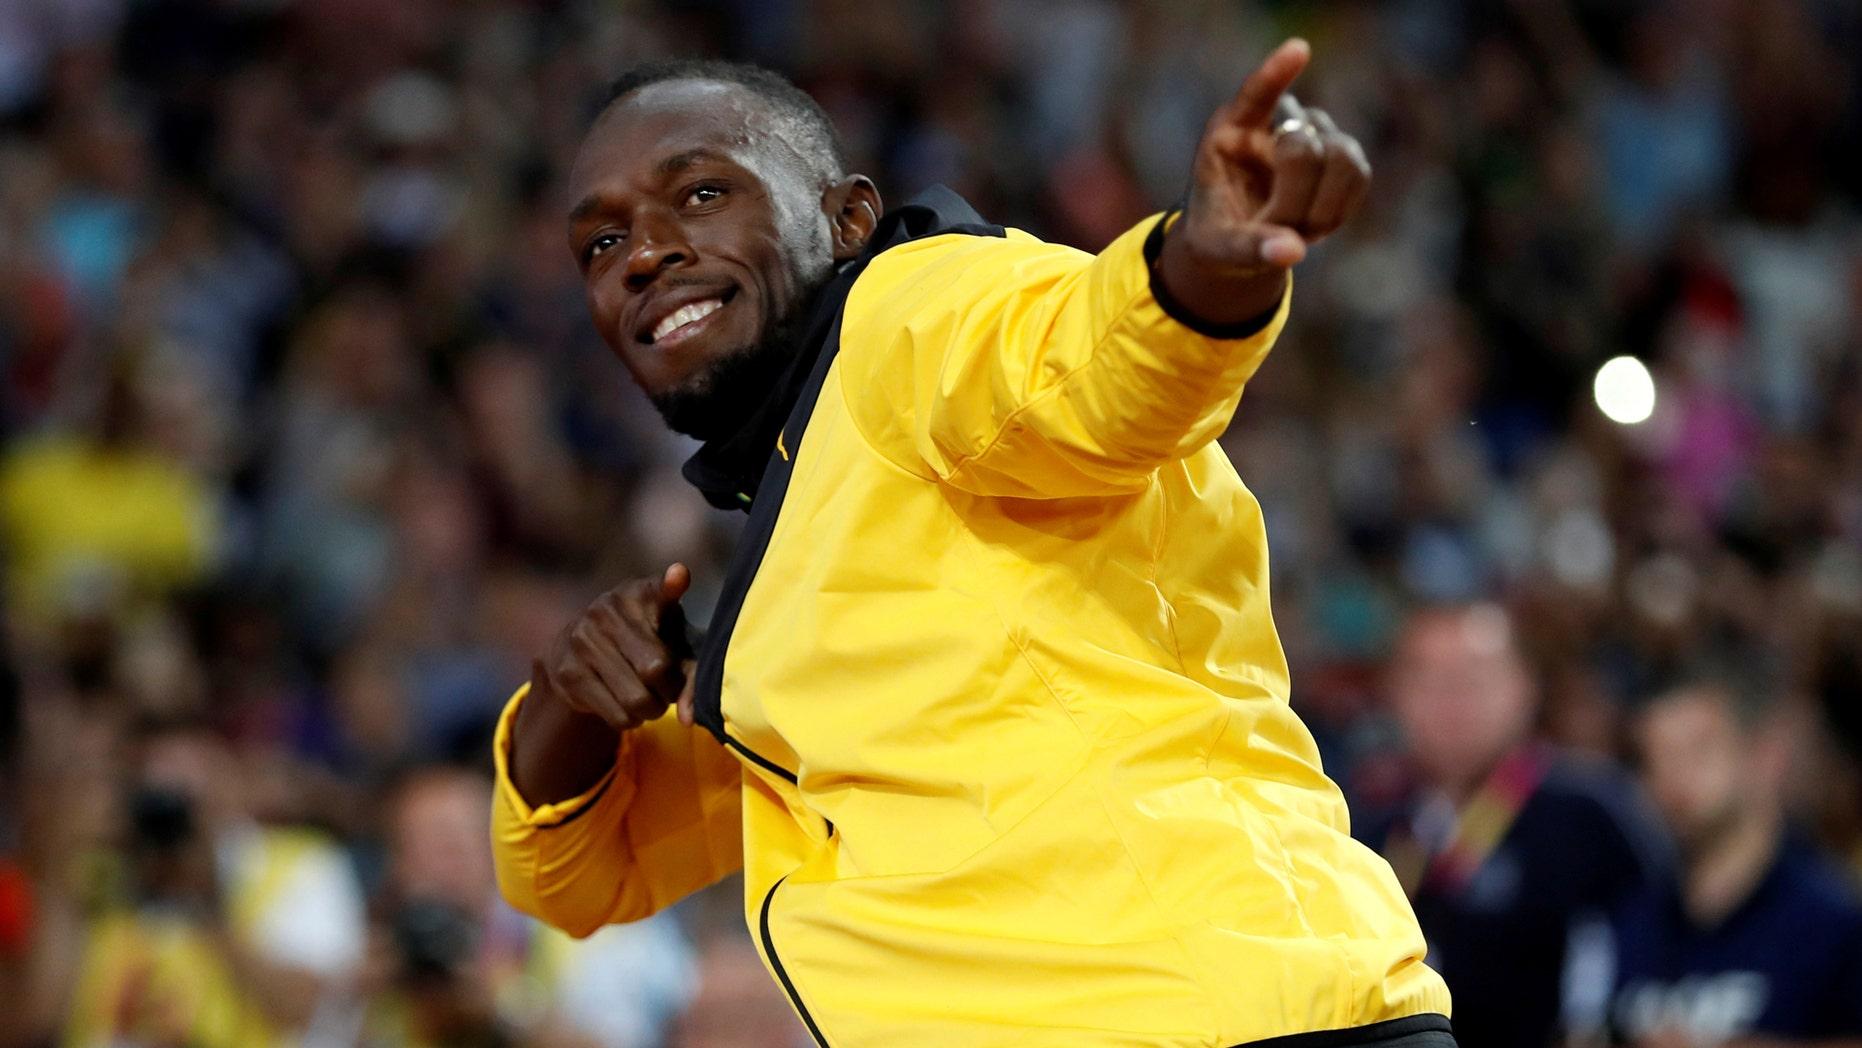 File photo - Athletics - World Athletics Championships – Usain Bolt's farewell ceremony – London Stadium, London, Britain – Aug. 13, 2017 – Usain Bolt of Jamaica gestures. (REUTERS/Phil Noble)